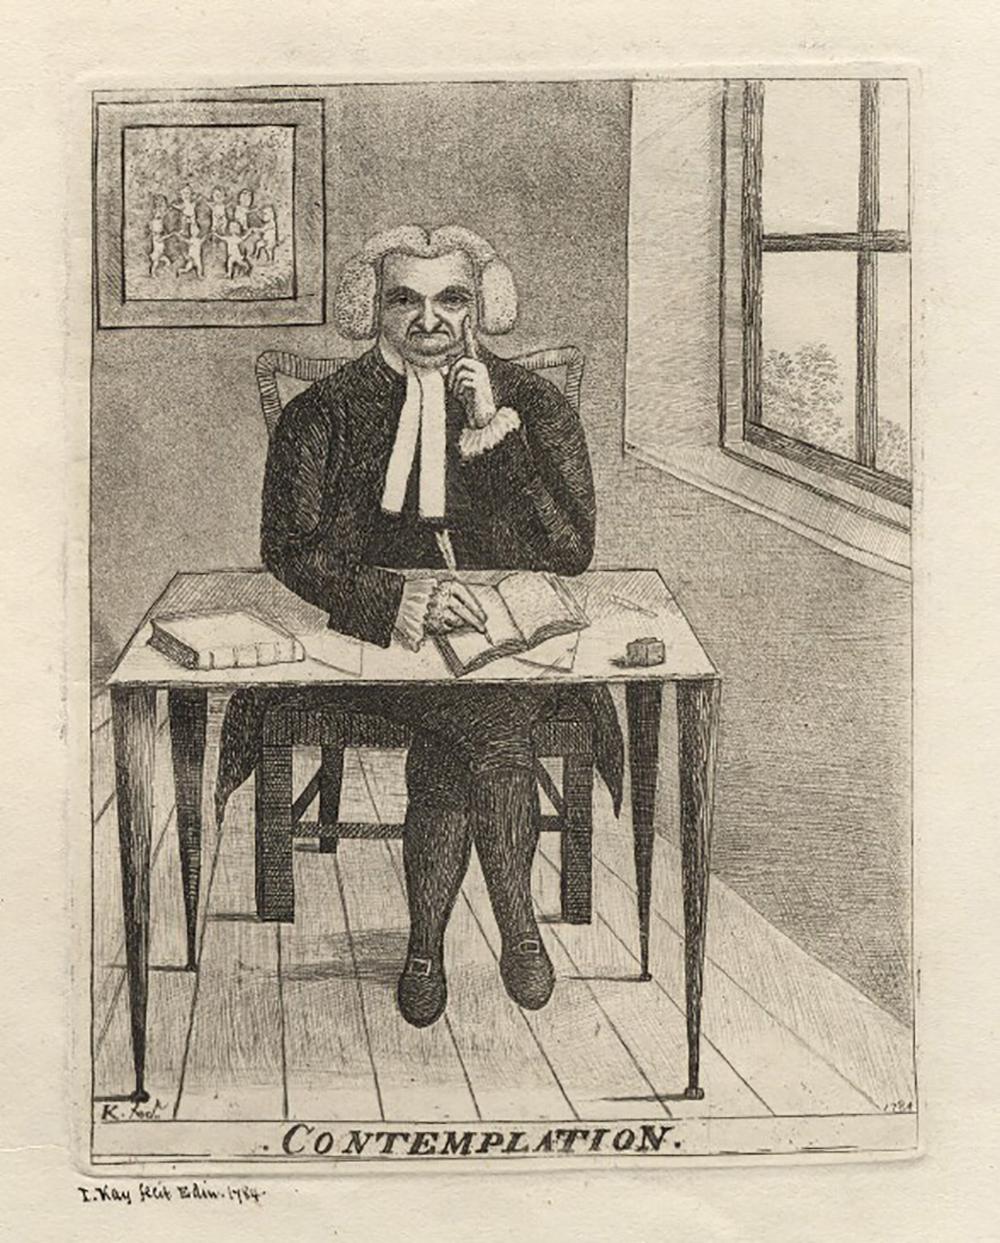 Contemplation (James Burnett, Lord Monboddo), by John Kay, 1784.